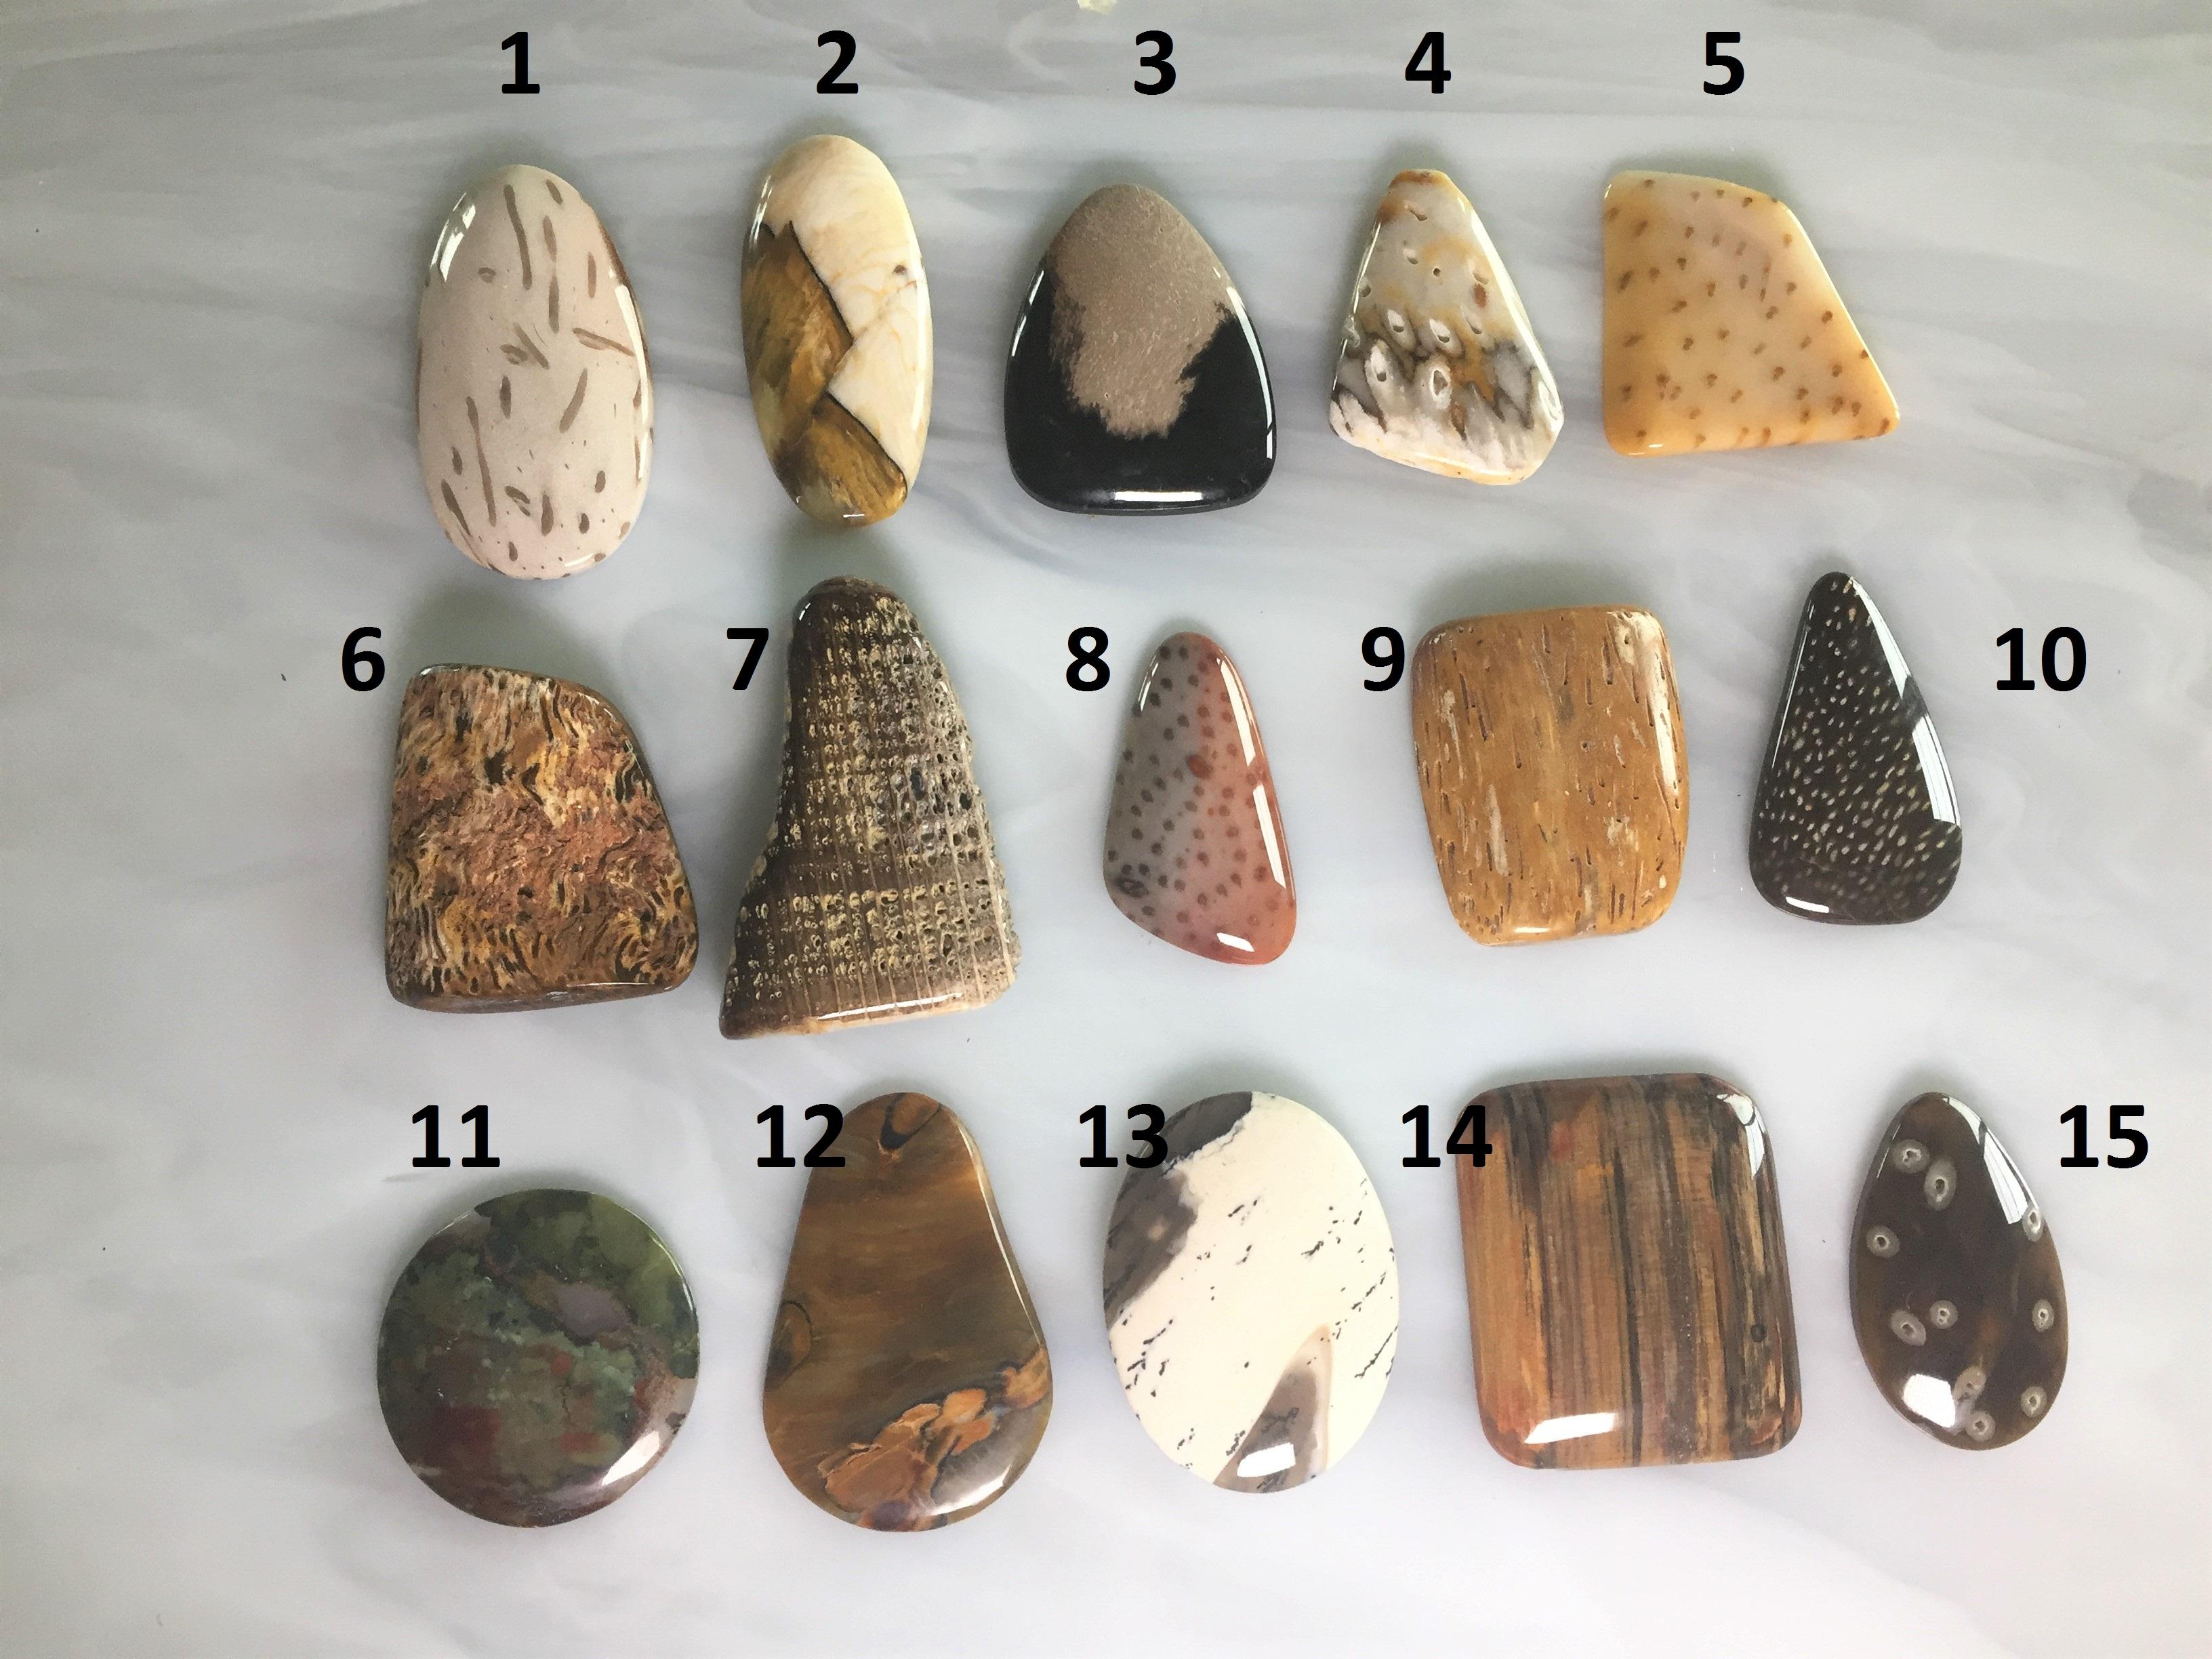 Brown Stone Creek Designer Statement Opalized Wood Neutral Teardrop Cabochon Beige White Large Petrified Australia Cab Fossil